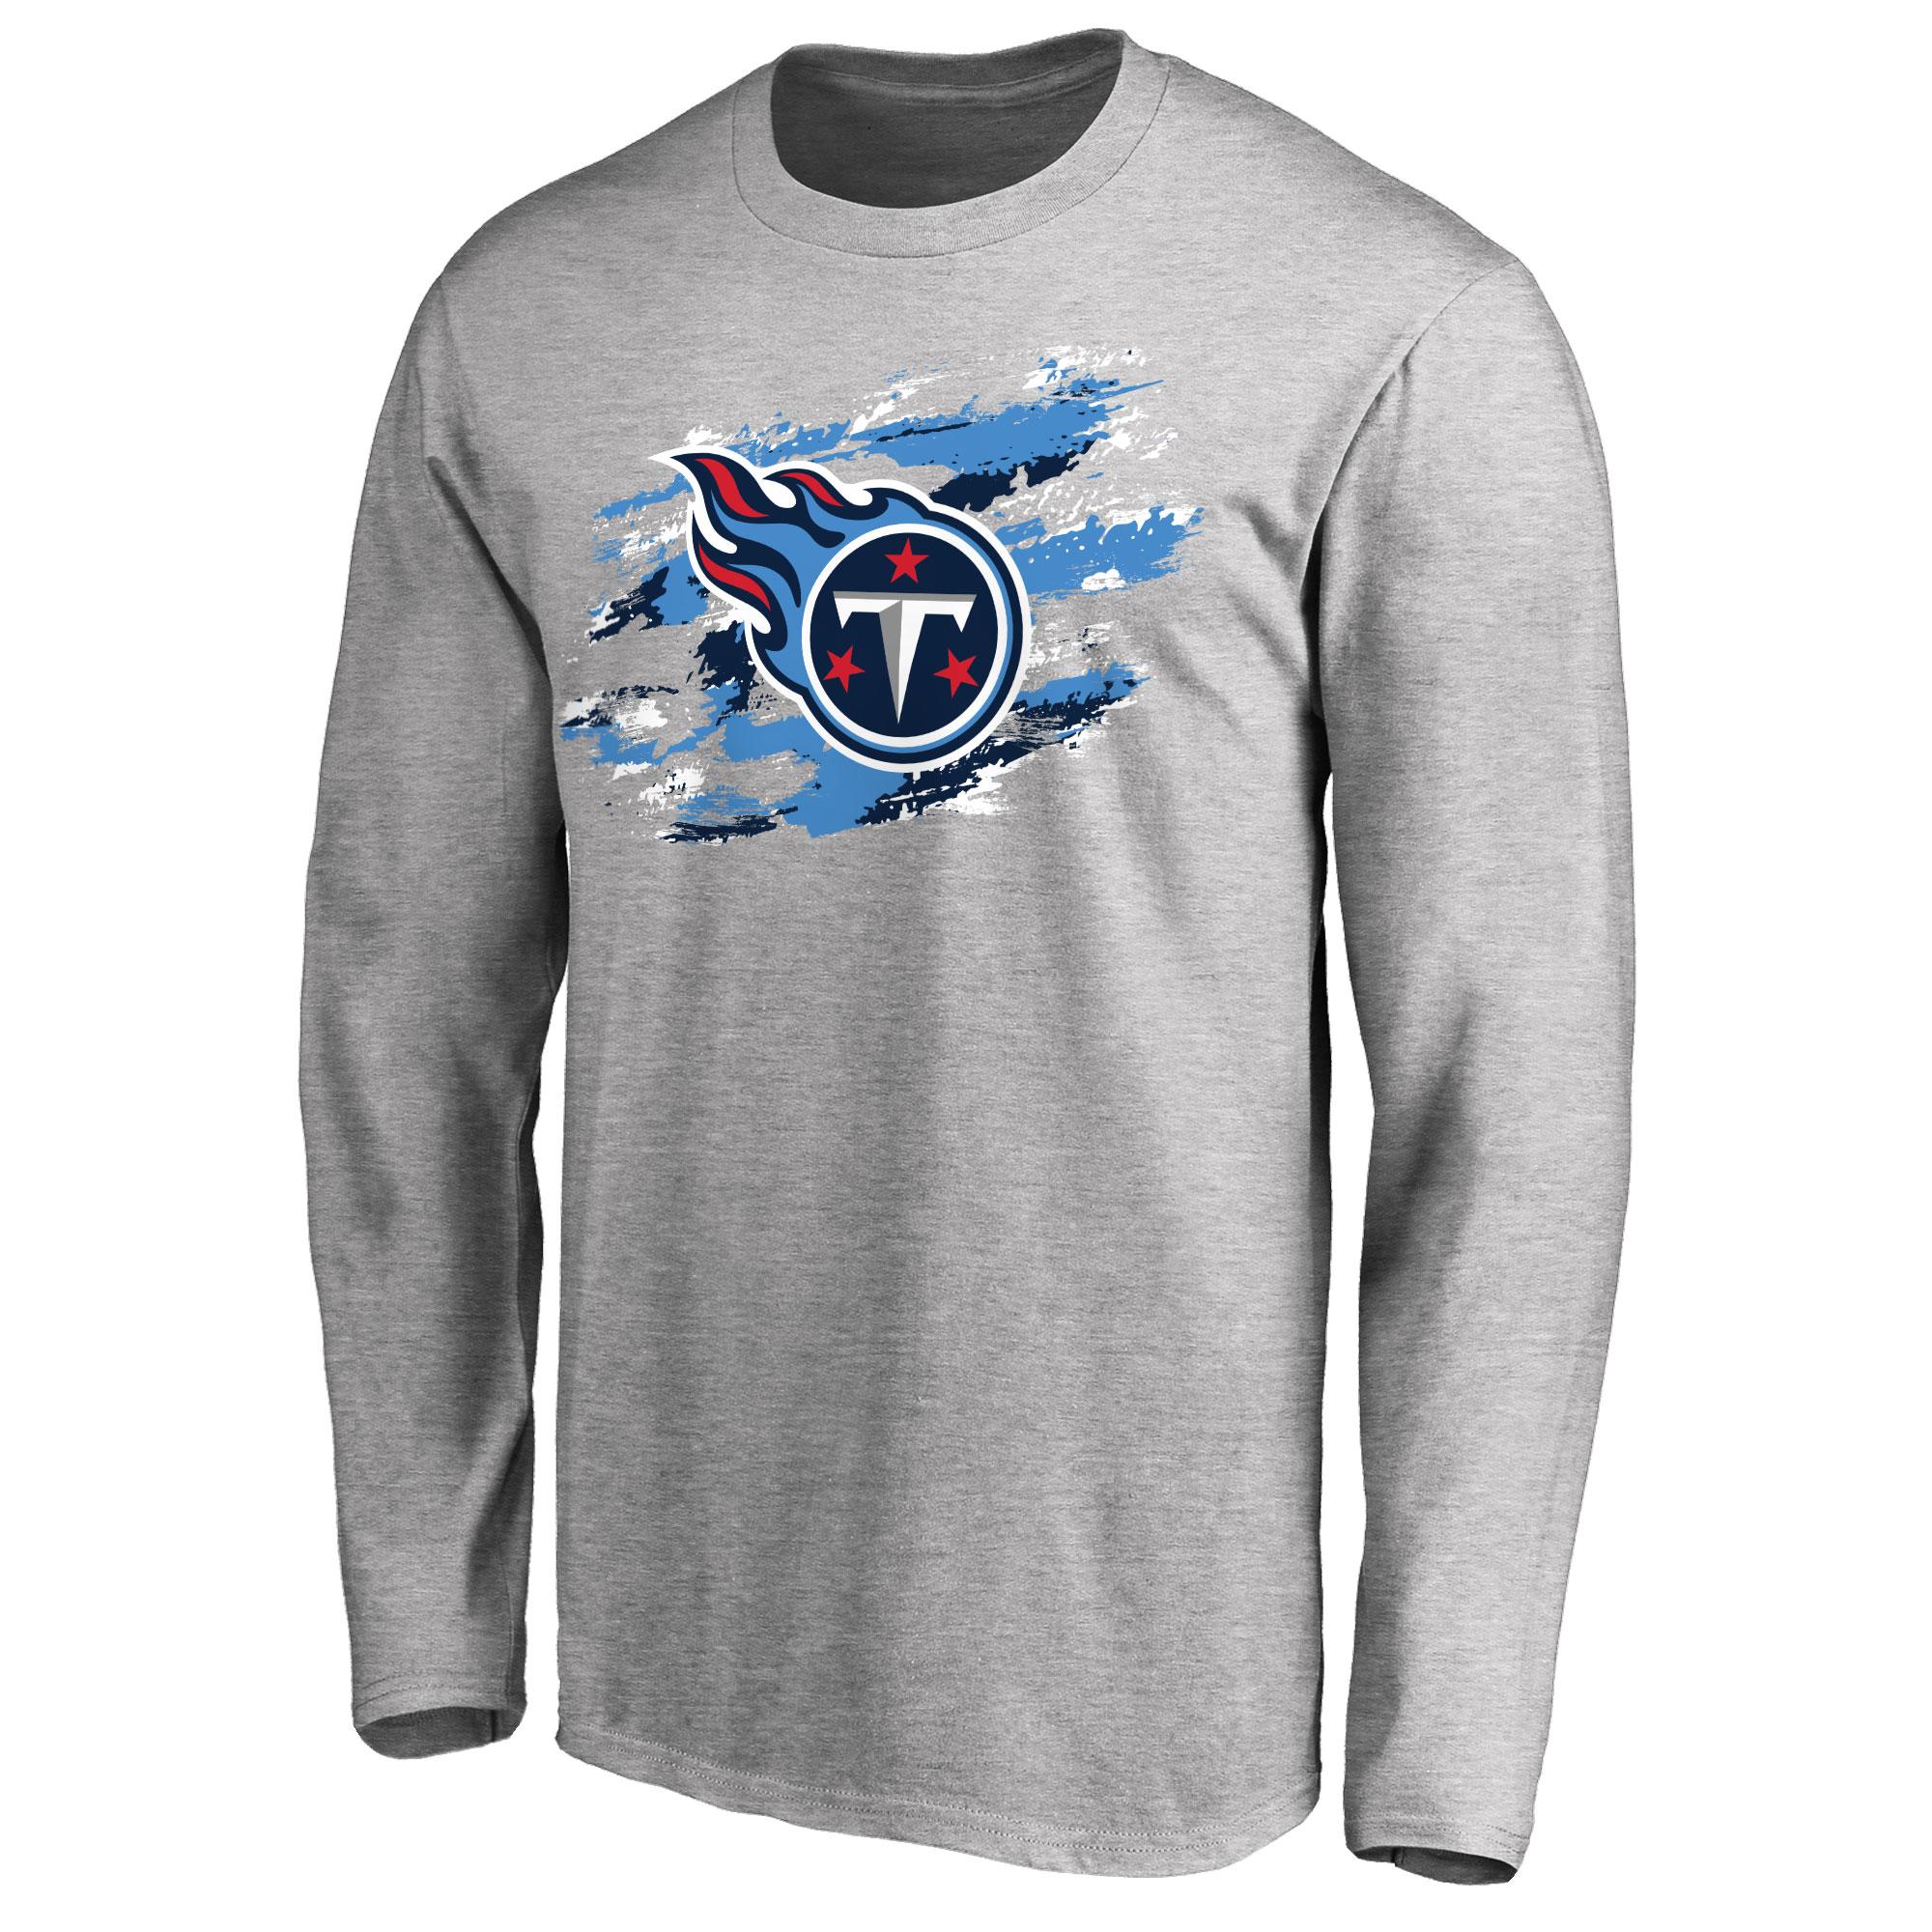 Tennessee Titans NFL Pro Line True Colors Long Sleeve T-Shirt - Ash